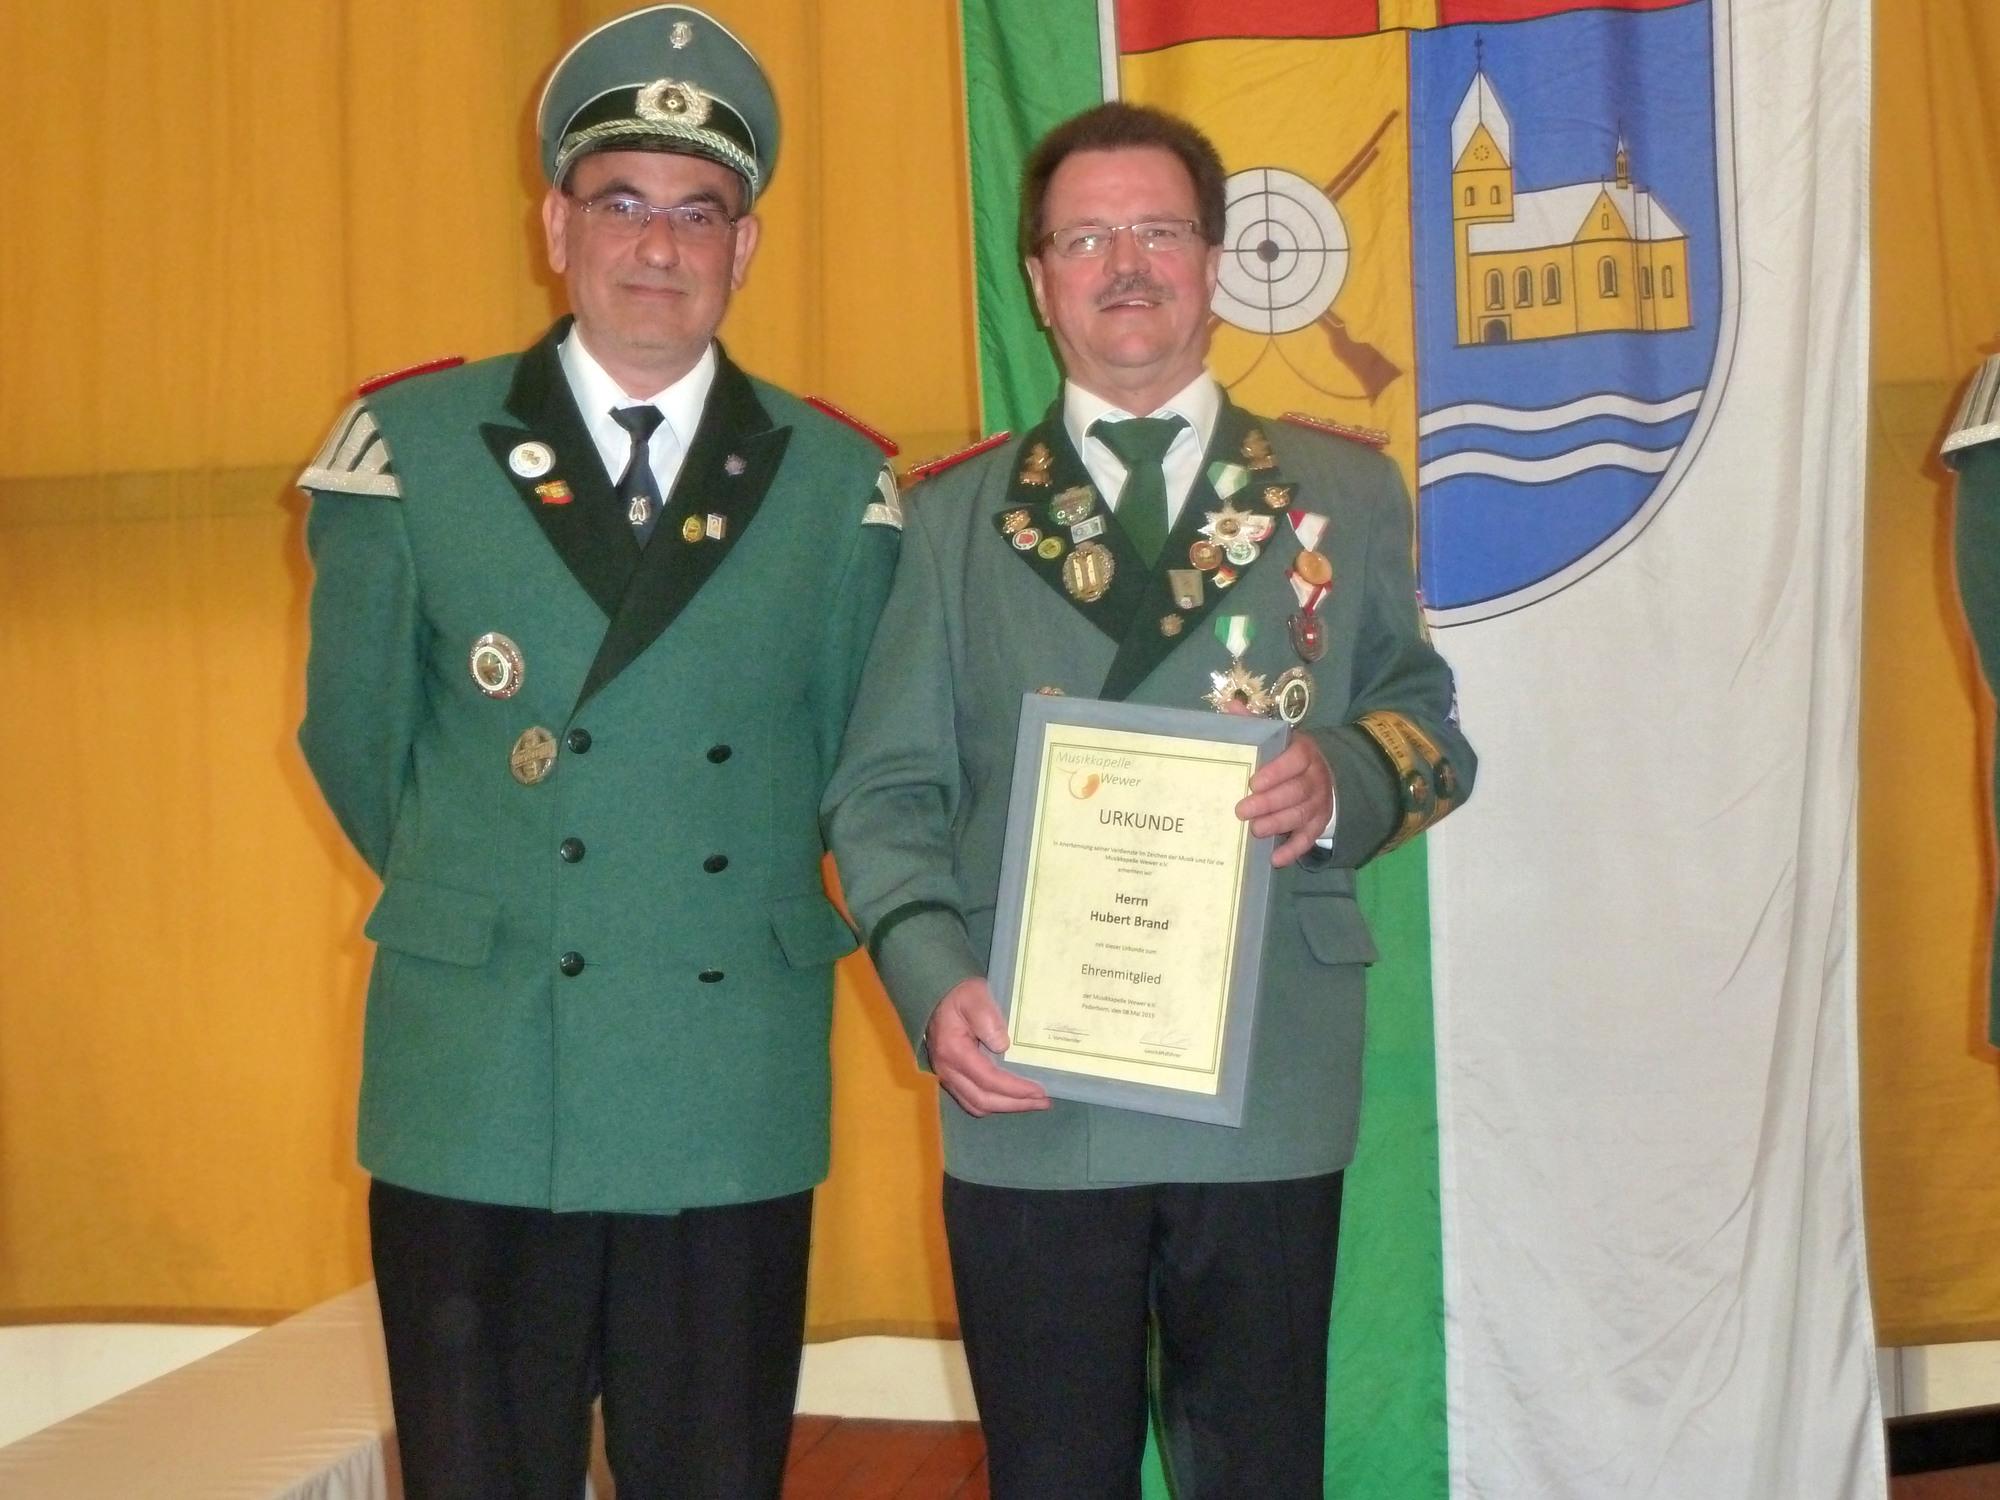 Werner Pahlsmeier, Hubert Brand